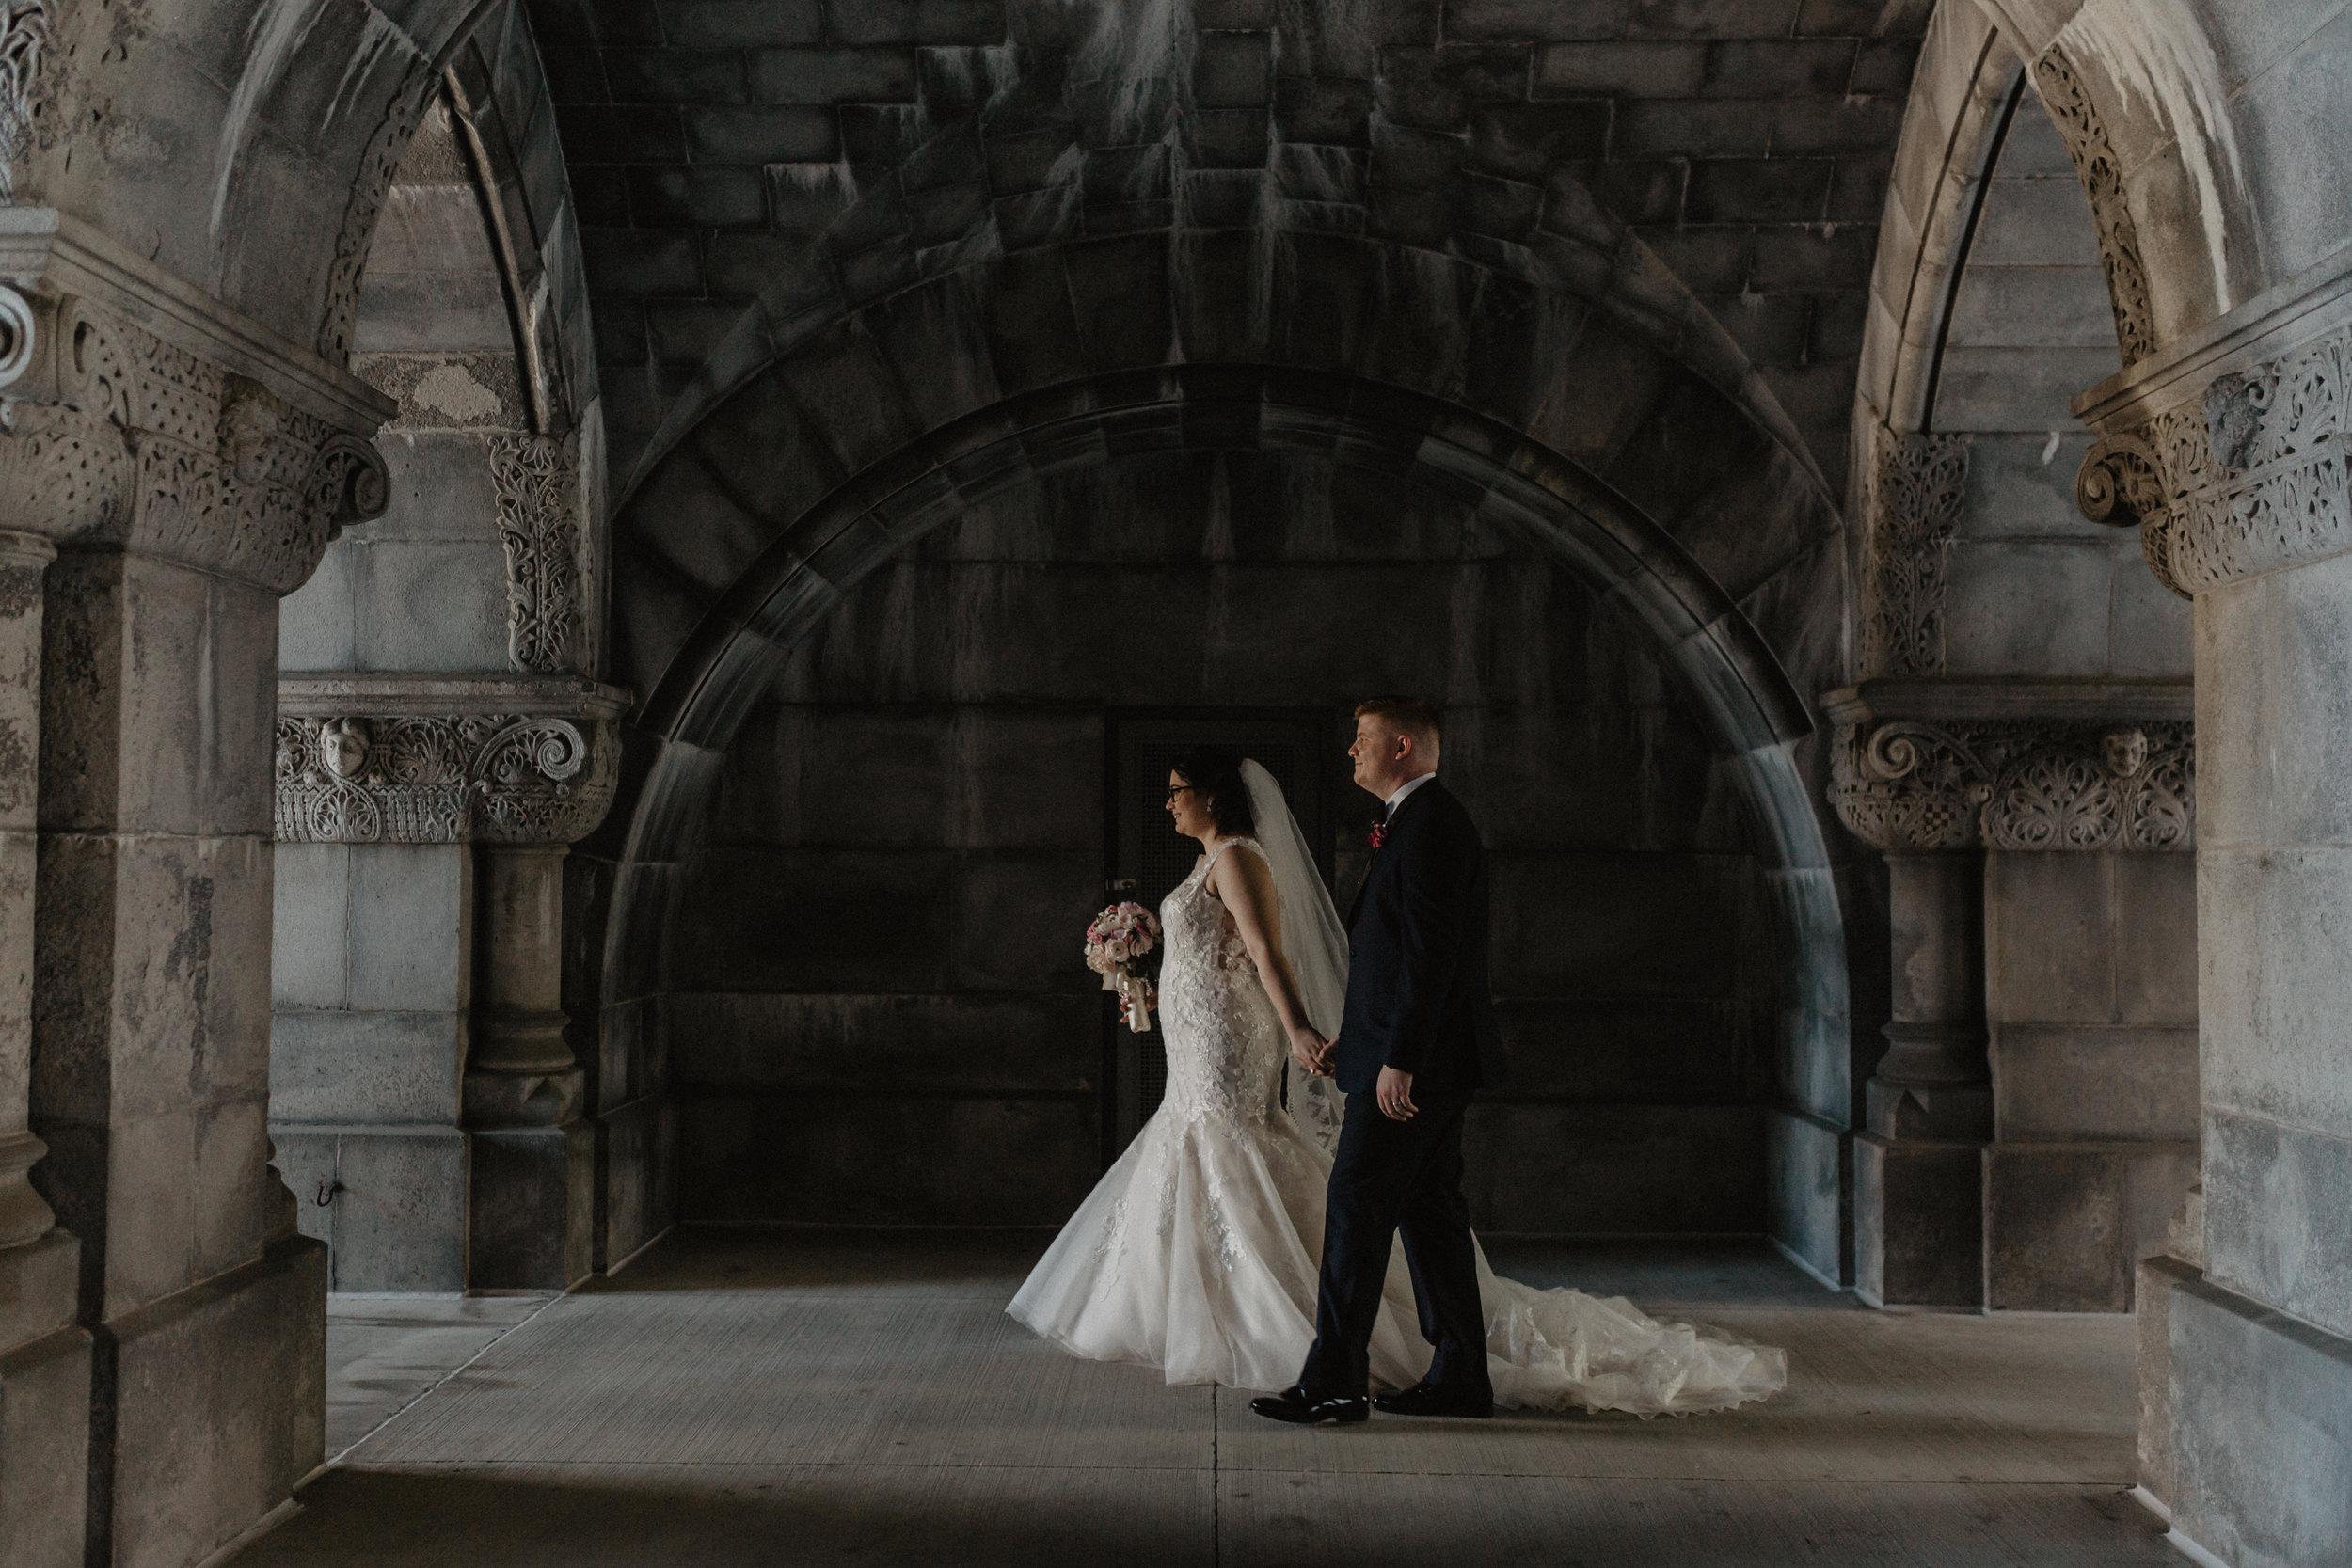 albany-new-york-wedding-34.jpg